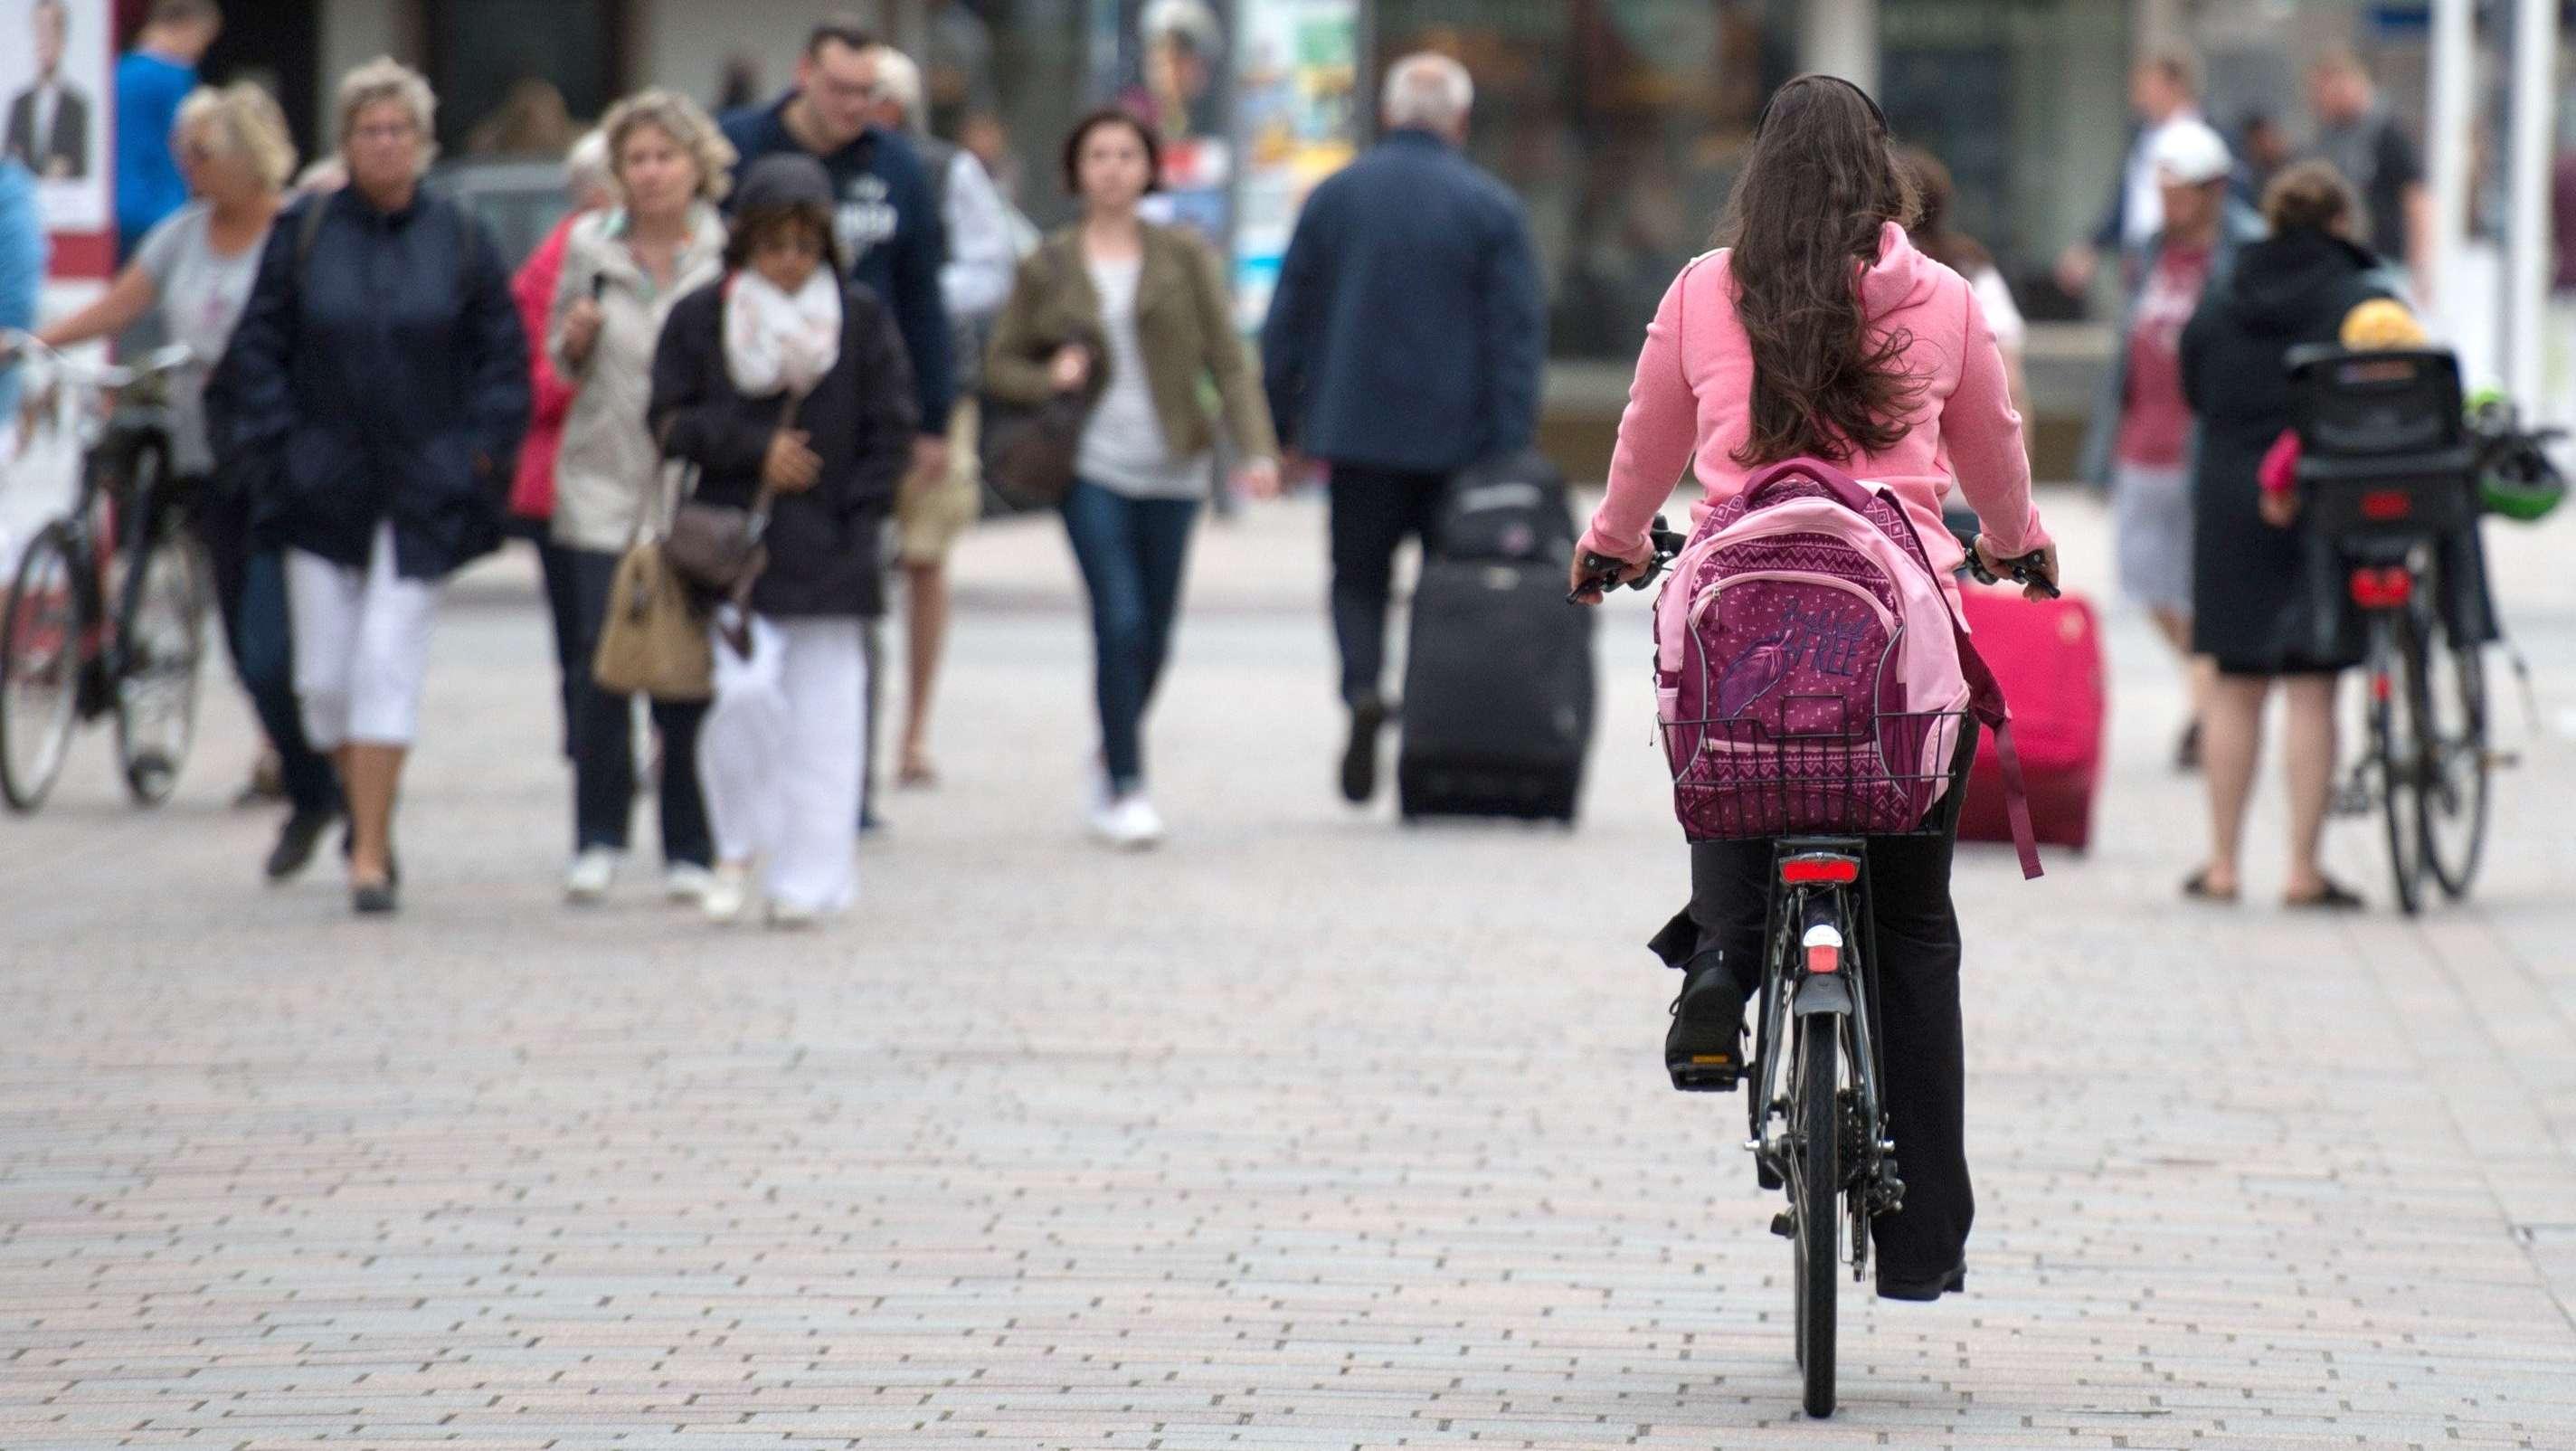 Radfahrerin in Fußgängerzone (Symbolbild)